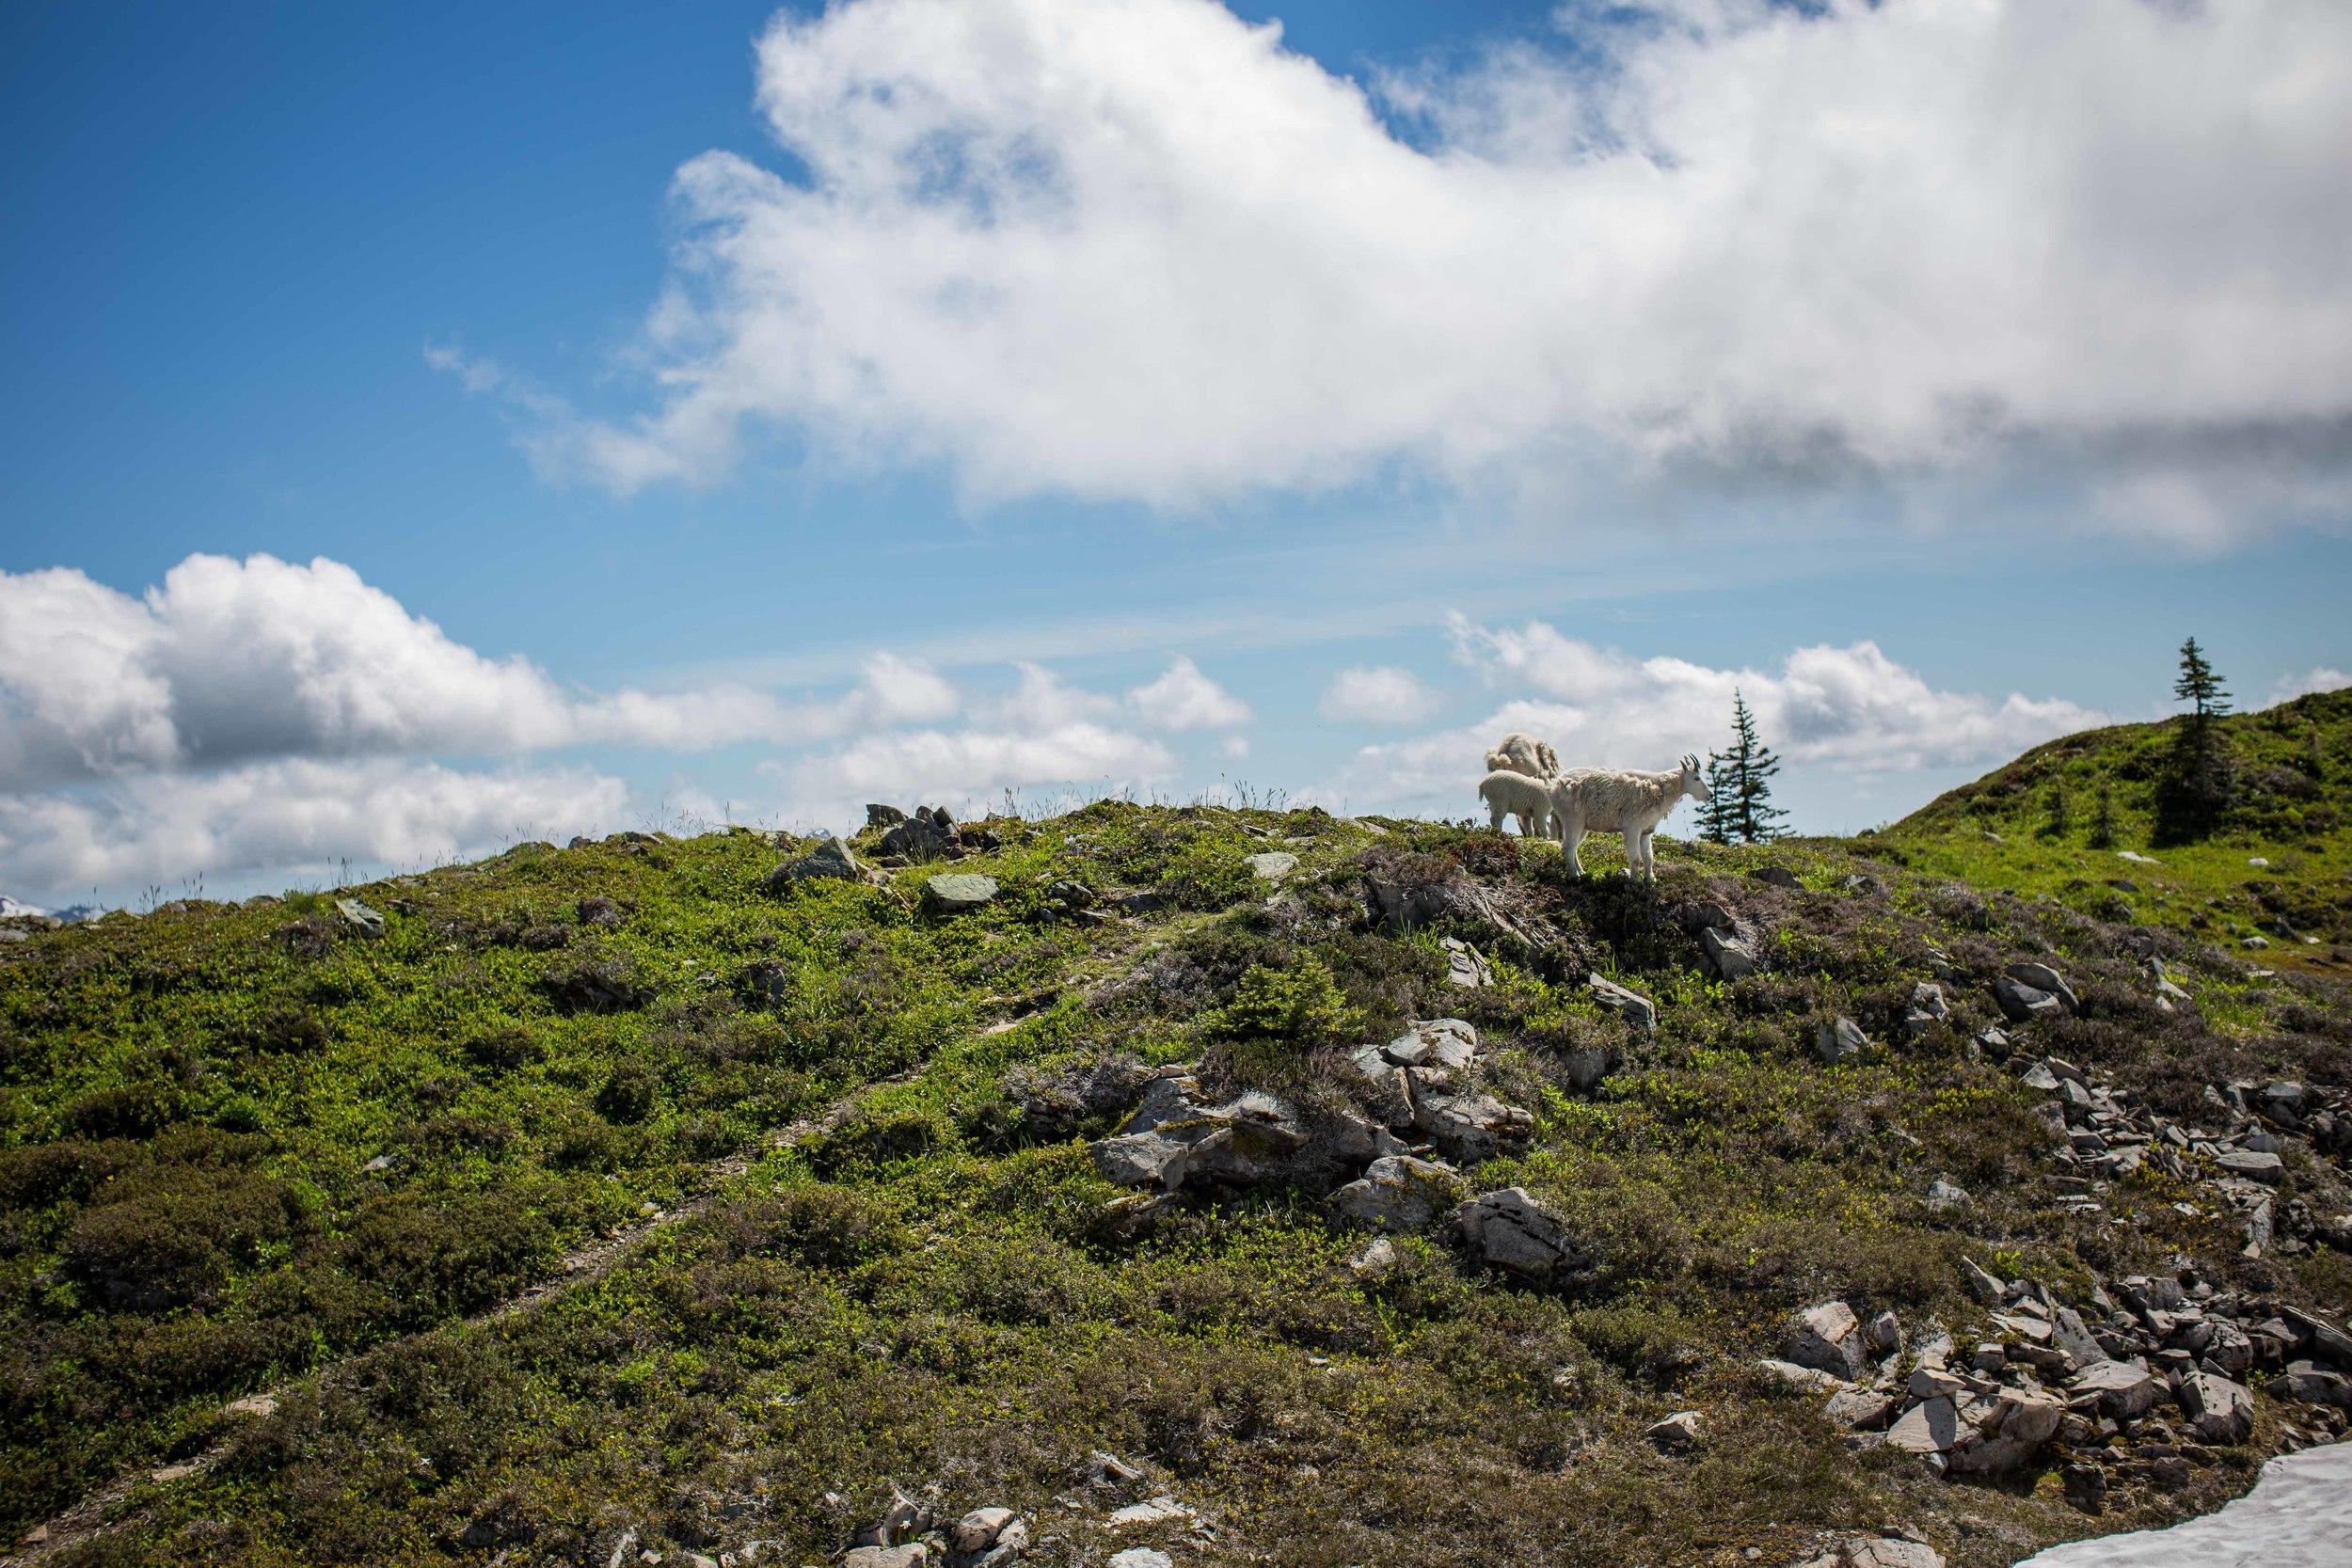 A family of goats came to visit us near Bogachiel Peak